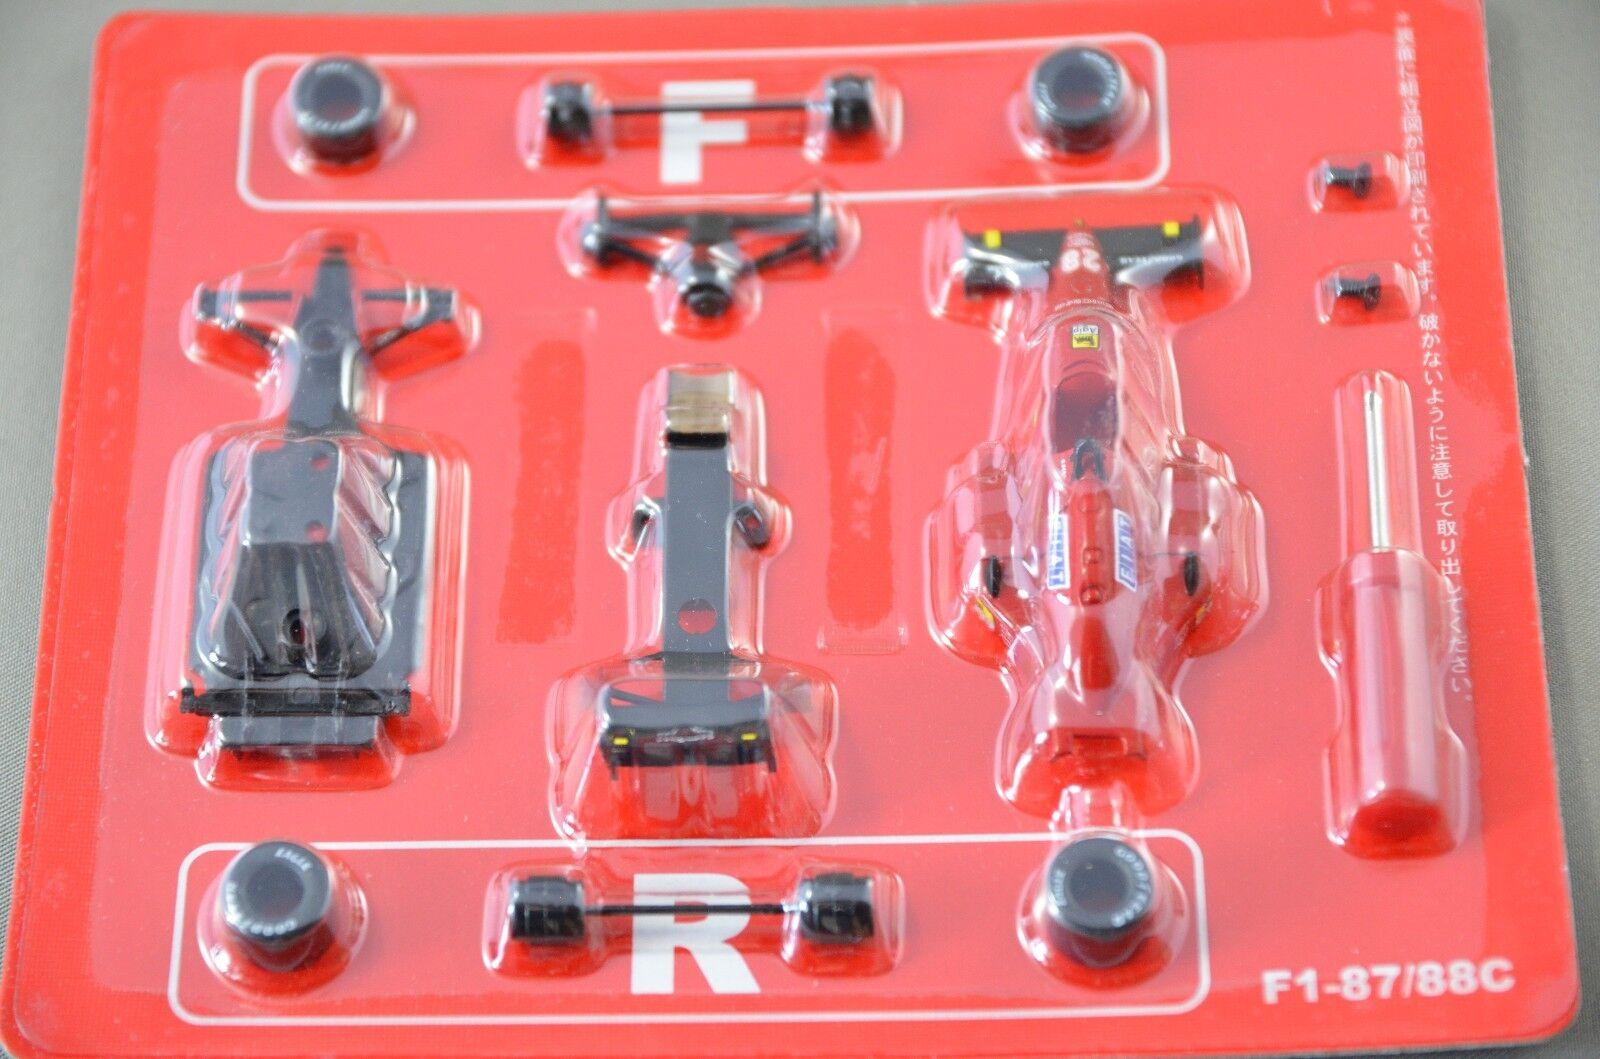 1 64 Kyosho Ferrari F1 87 88C nr.28 G.Berger 1988 tärningskast modelllllerler bil